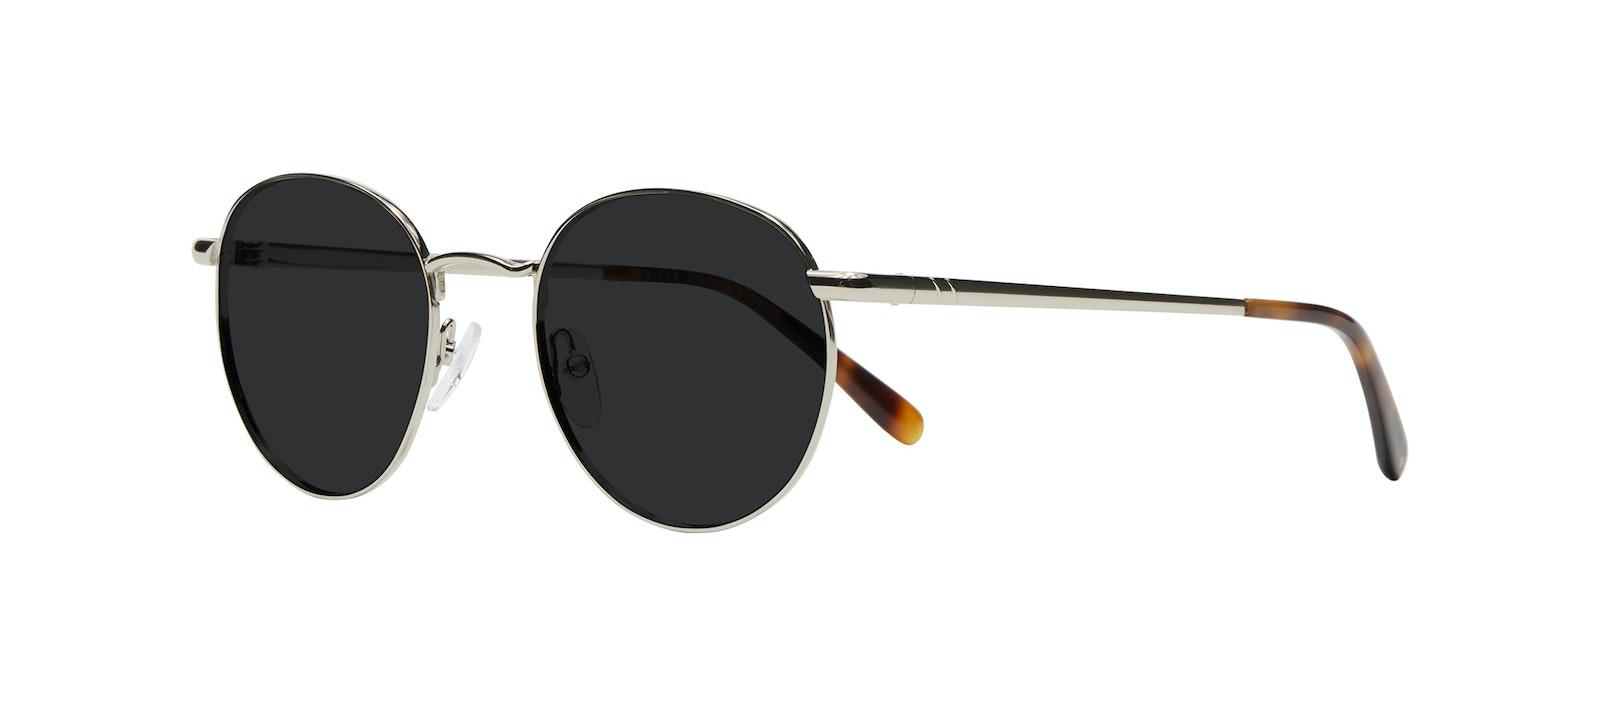 Affordable Fashion Glasses Round Sunglasses Women Dynasty M Silver Tilt